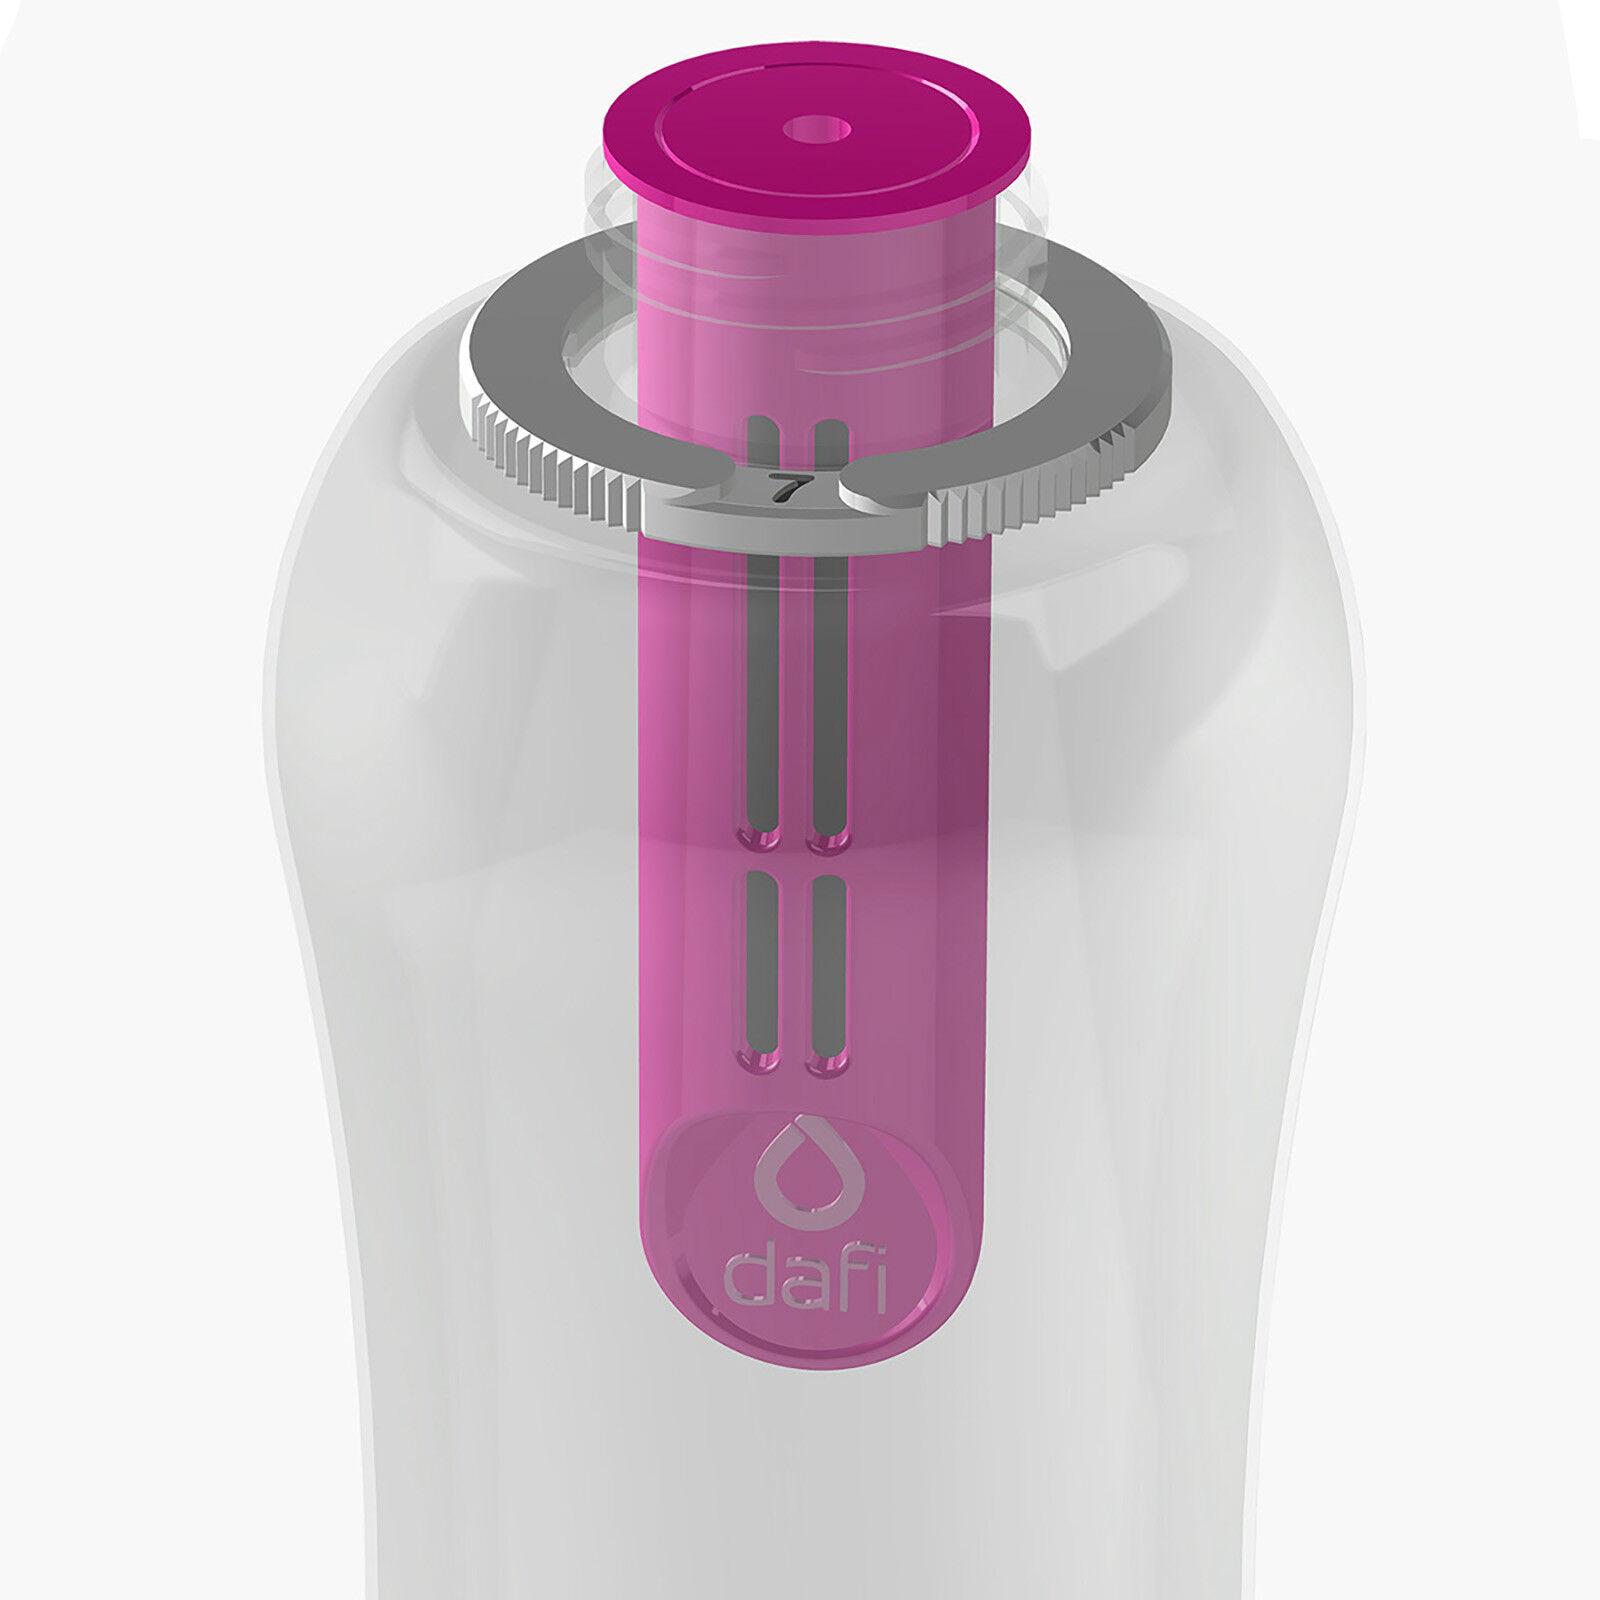 Original Bobble NEON PINK Sport Water Bottle 1L//34 FL OZ Brand New Sealed